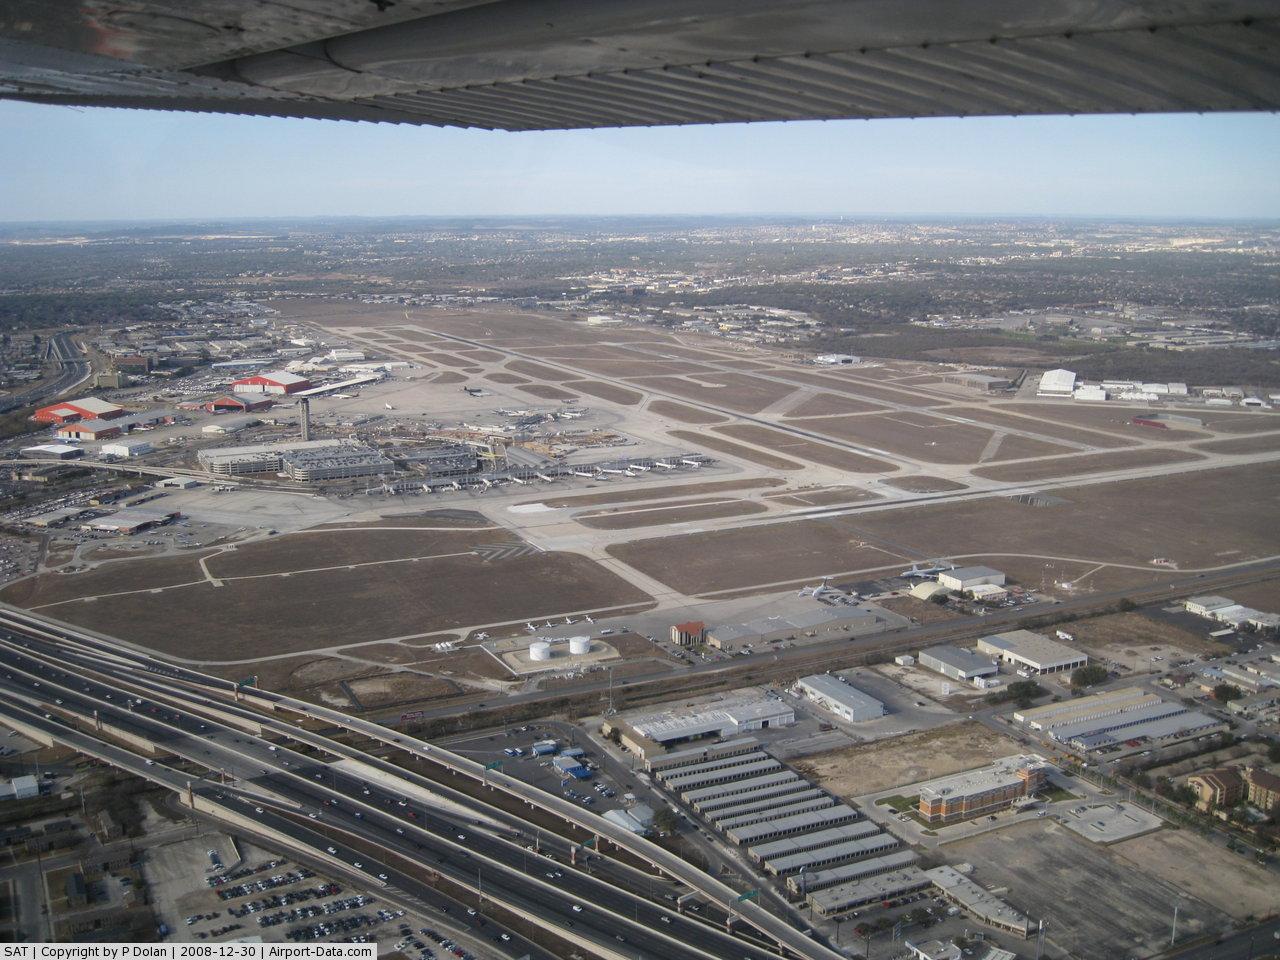 San Antonio Intl Airport